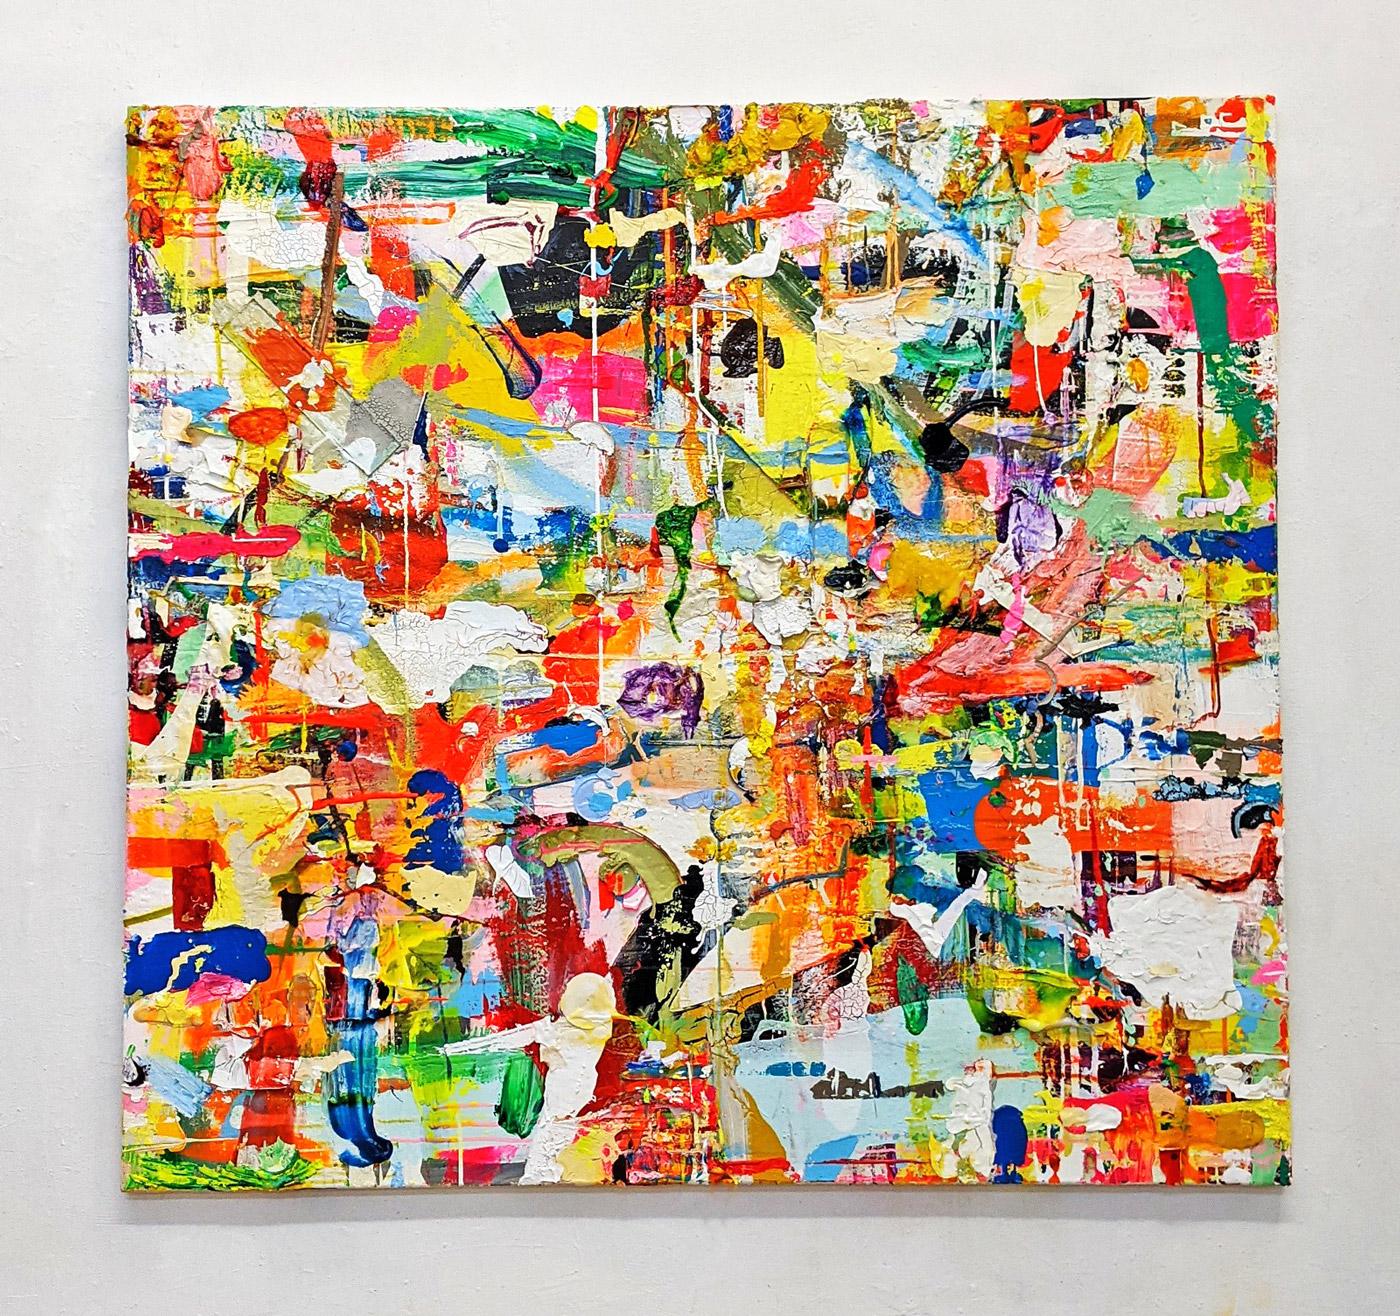 """Handelsplatz"", 150 x 160 cm, Acrylfarben, Leinwand, 2021"